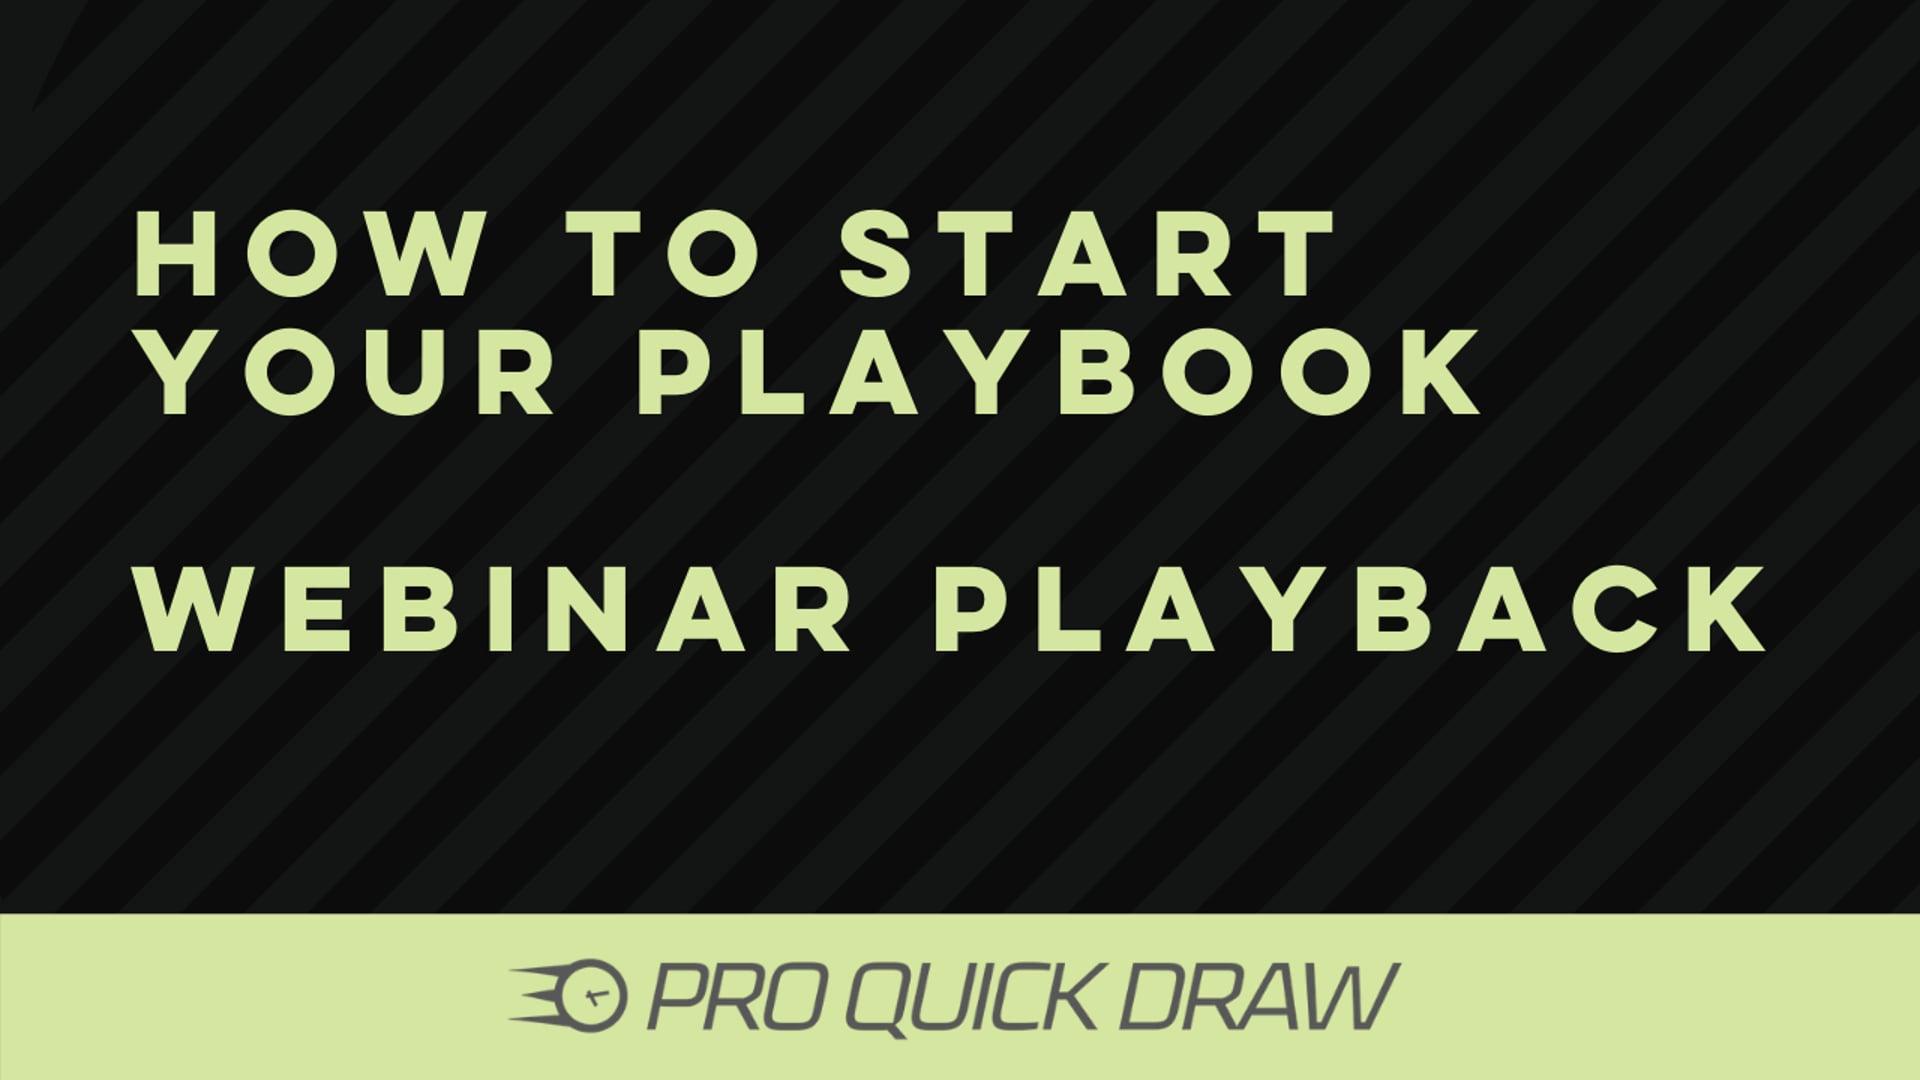 Webinar Playback: How to Start Your Playbook (Beginner)